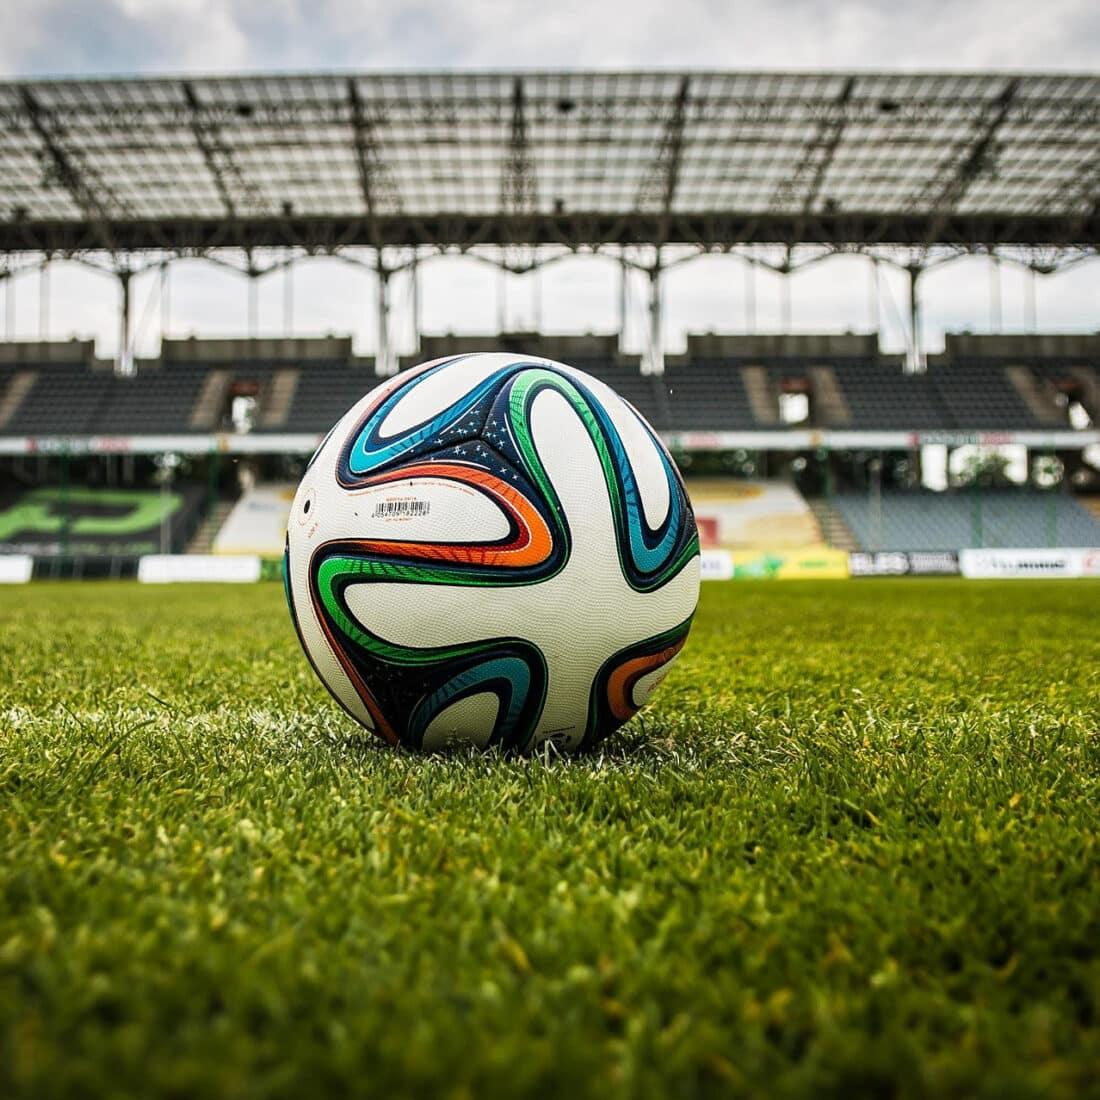 UEFA Champions League im Ausland sehen